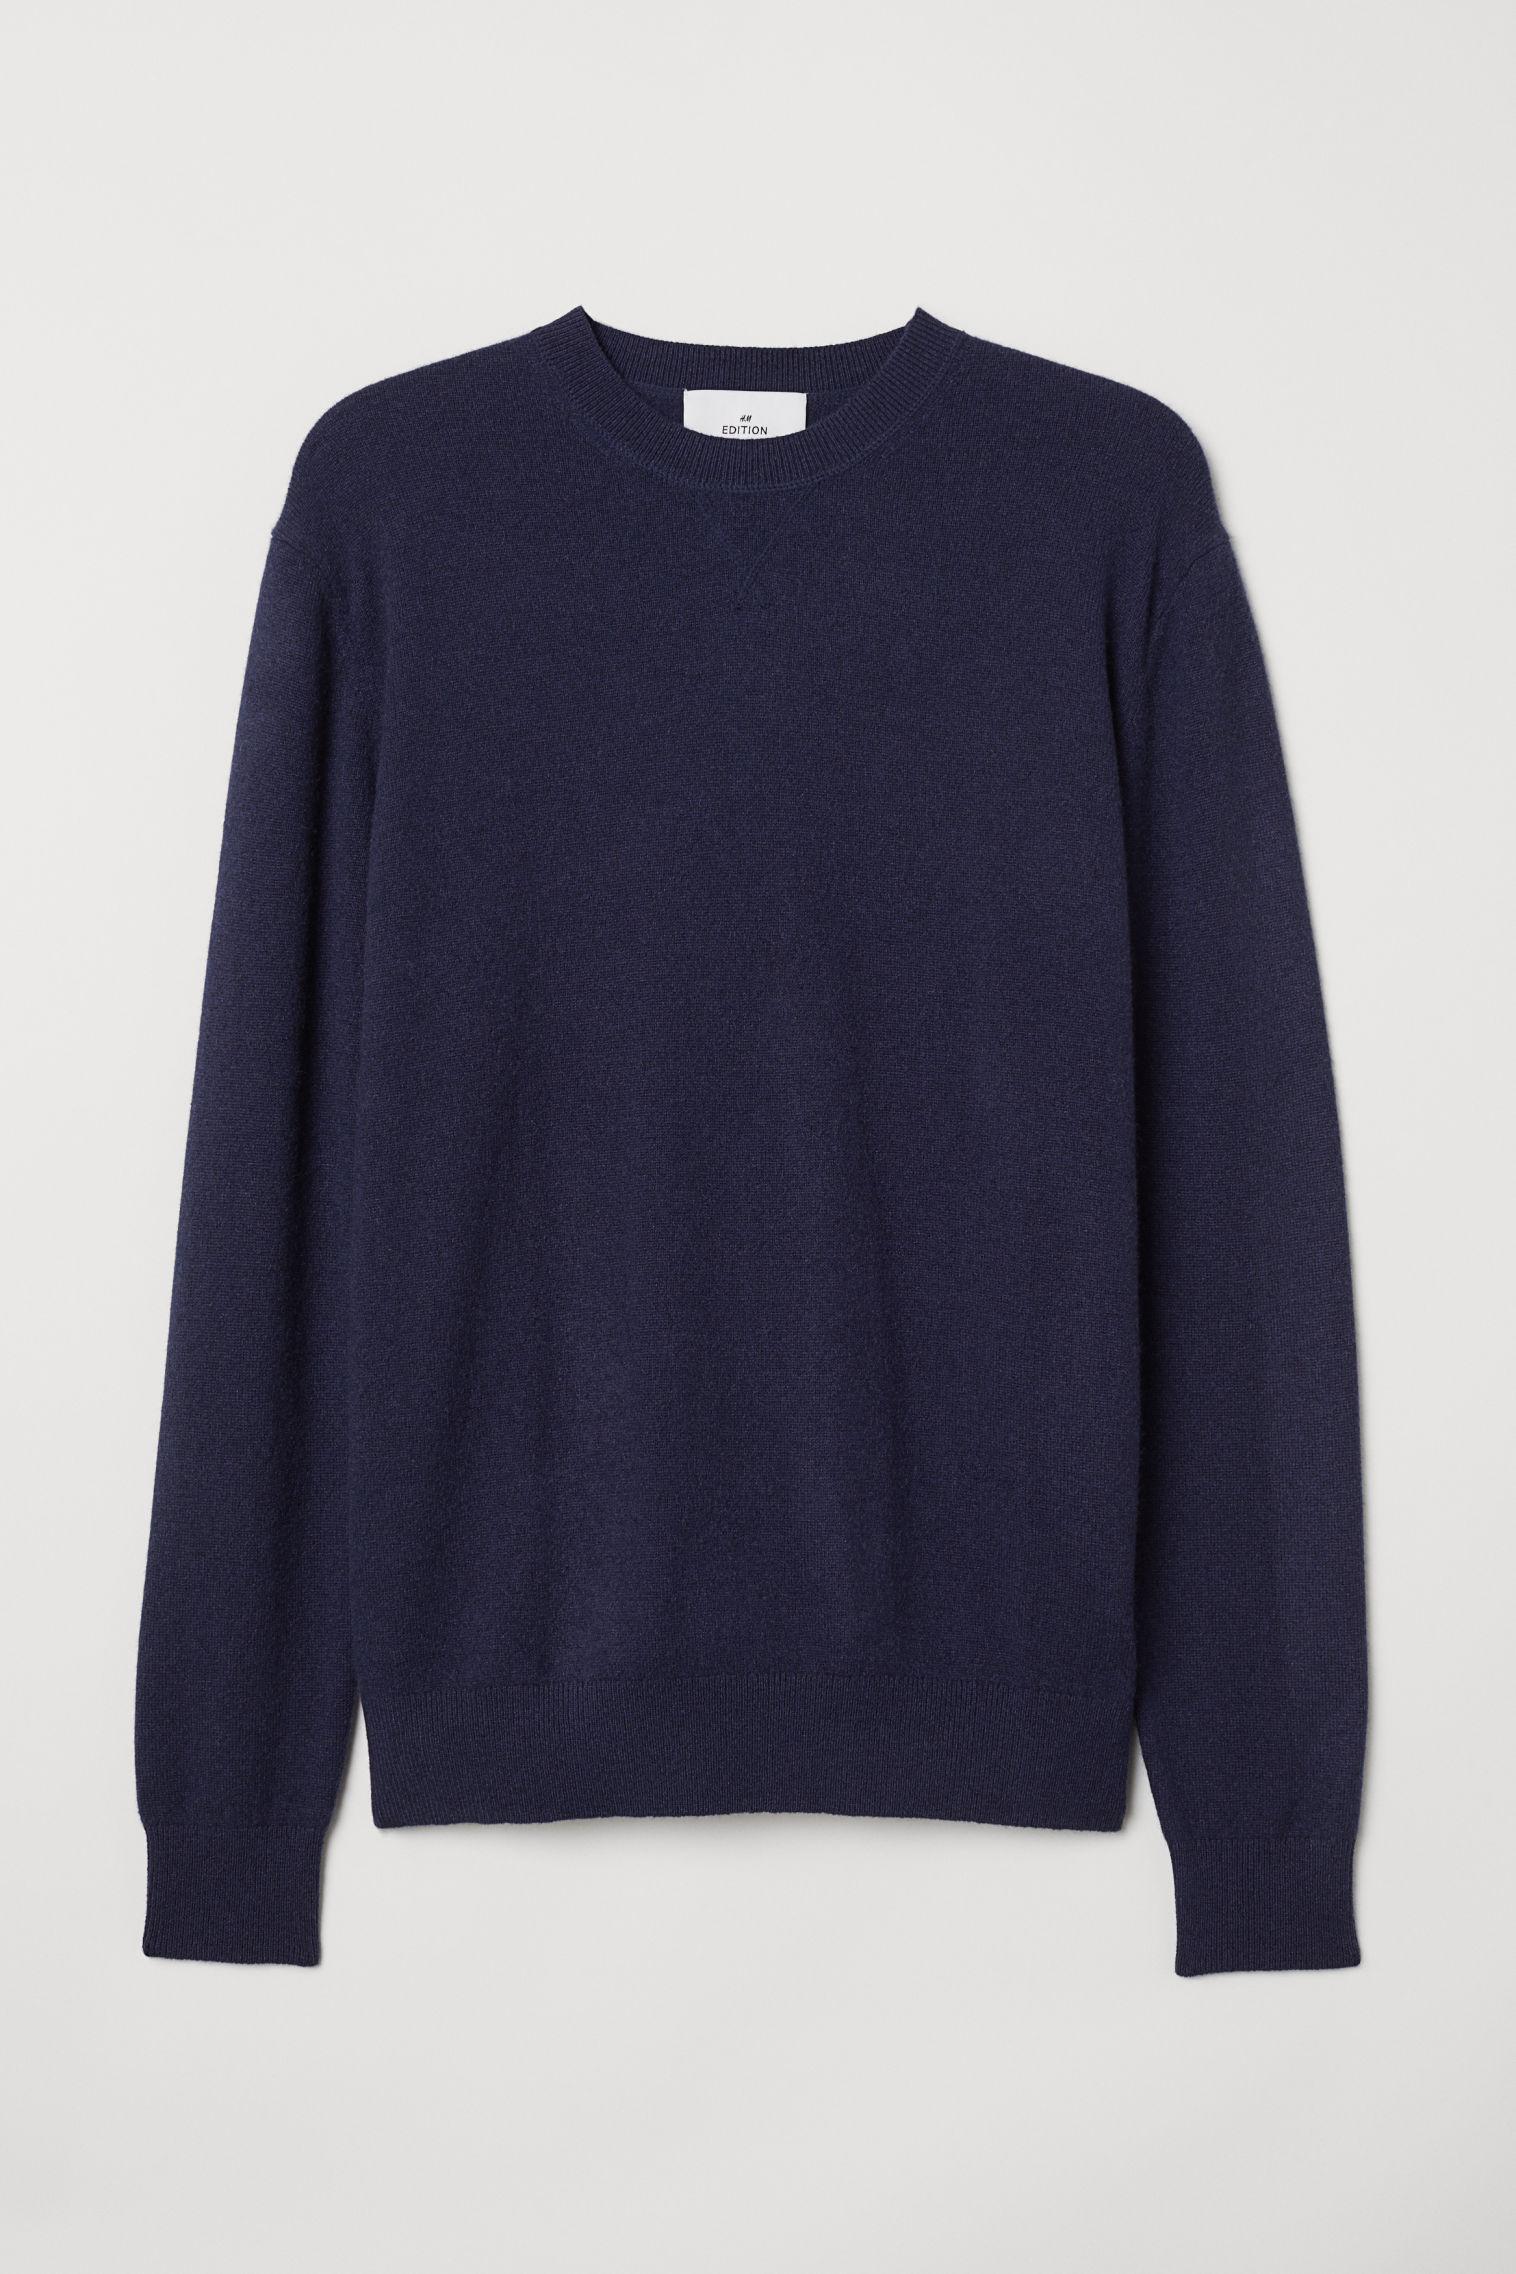 73a7835ae Cashmere Sweater - Light gray - Men